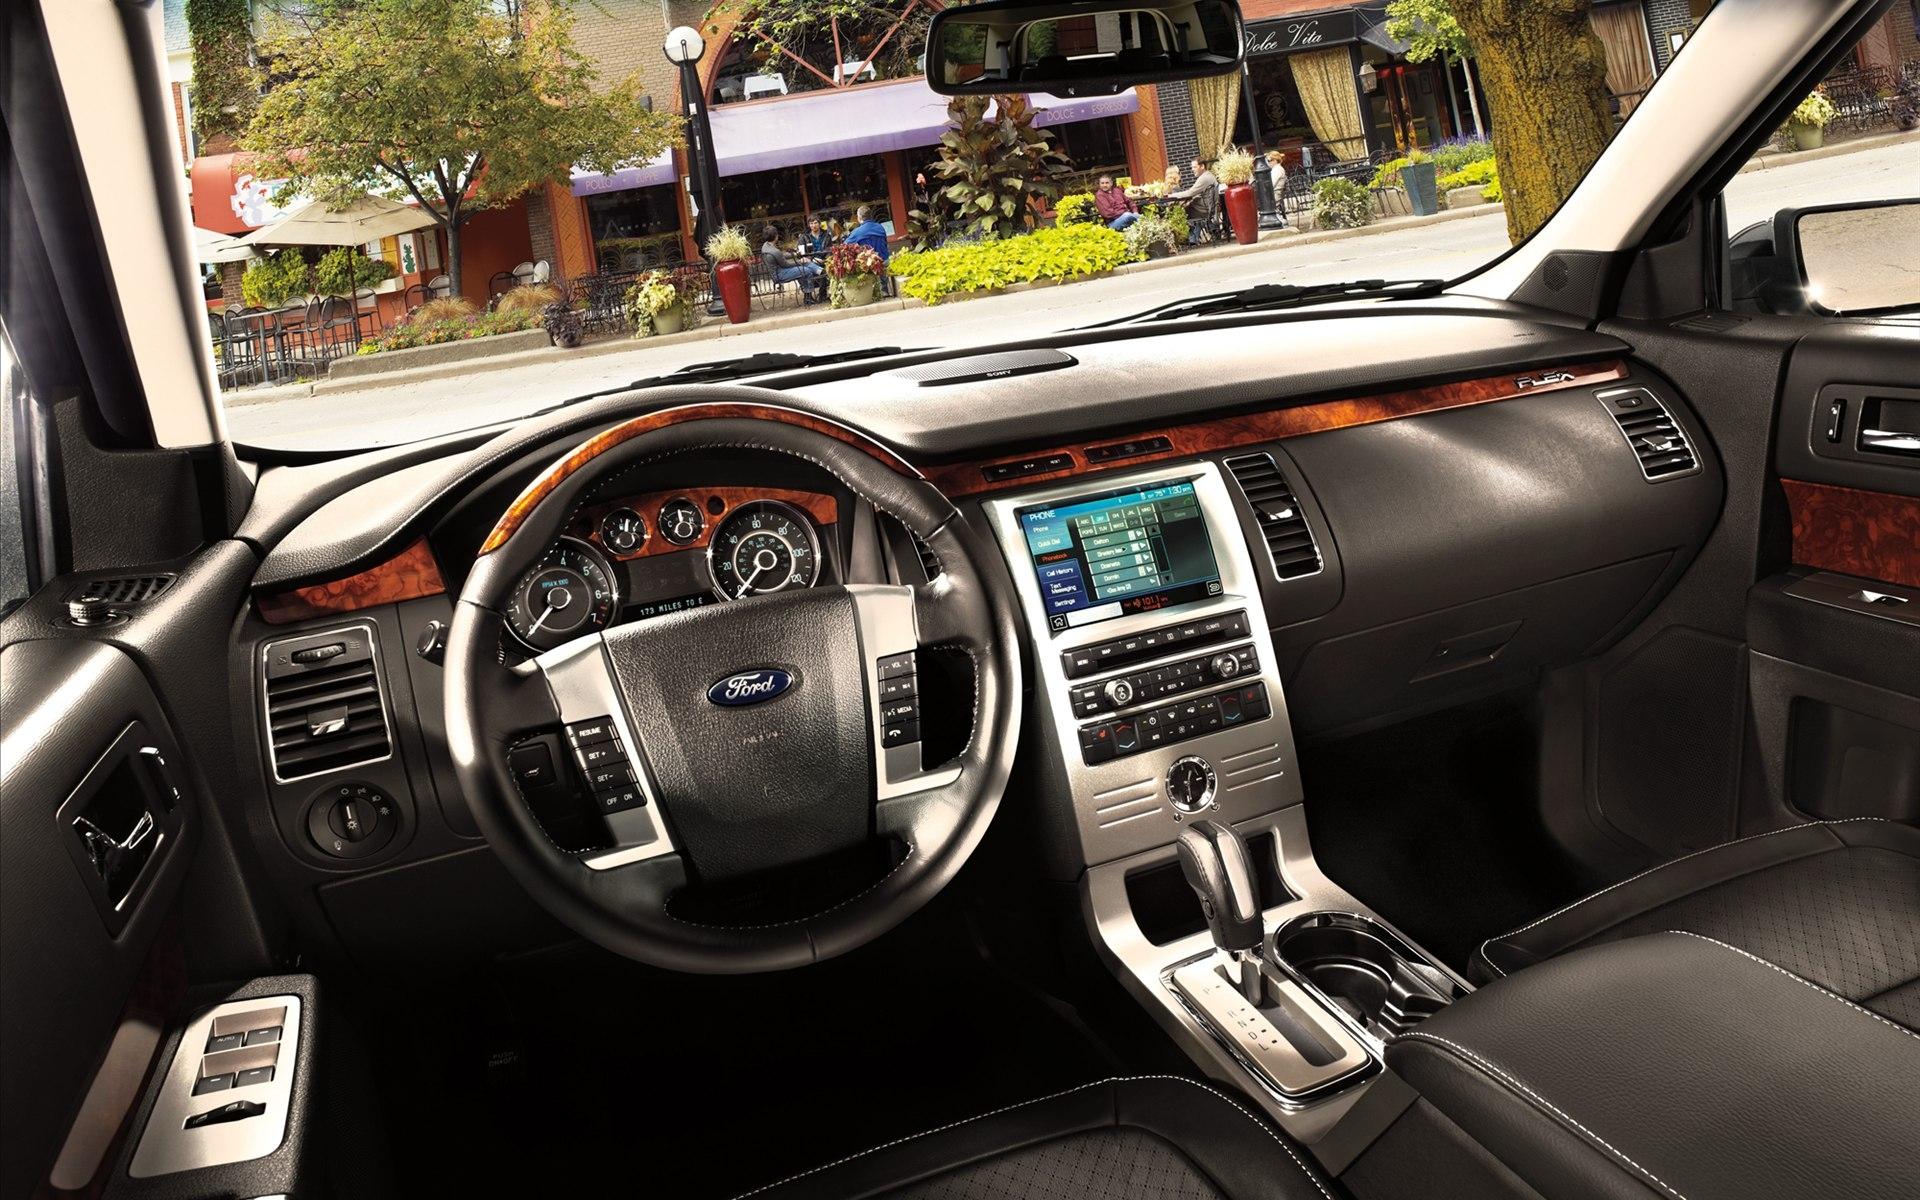 ford-flex-Ford-Flex-Sense-The-Car-within-Ford-Flex-Wallpa-wallpaper-wp3601025